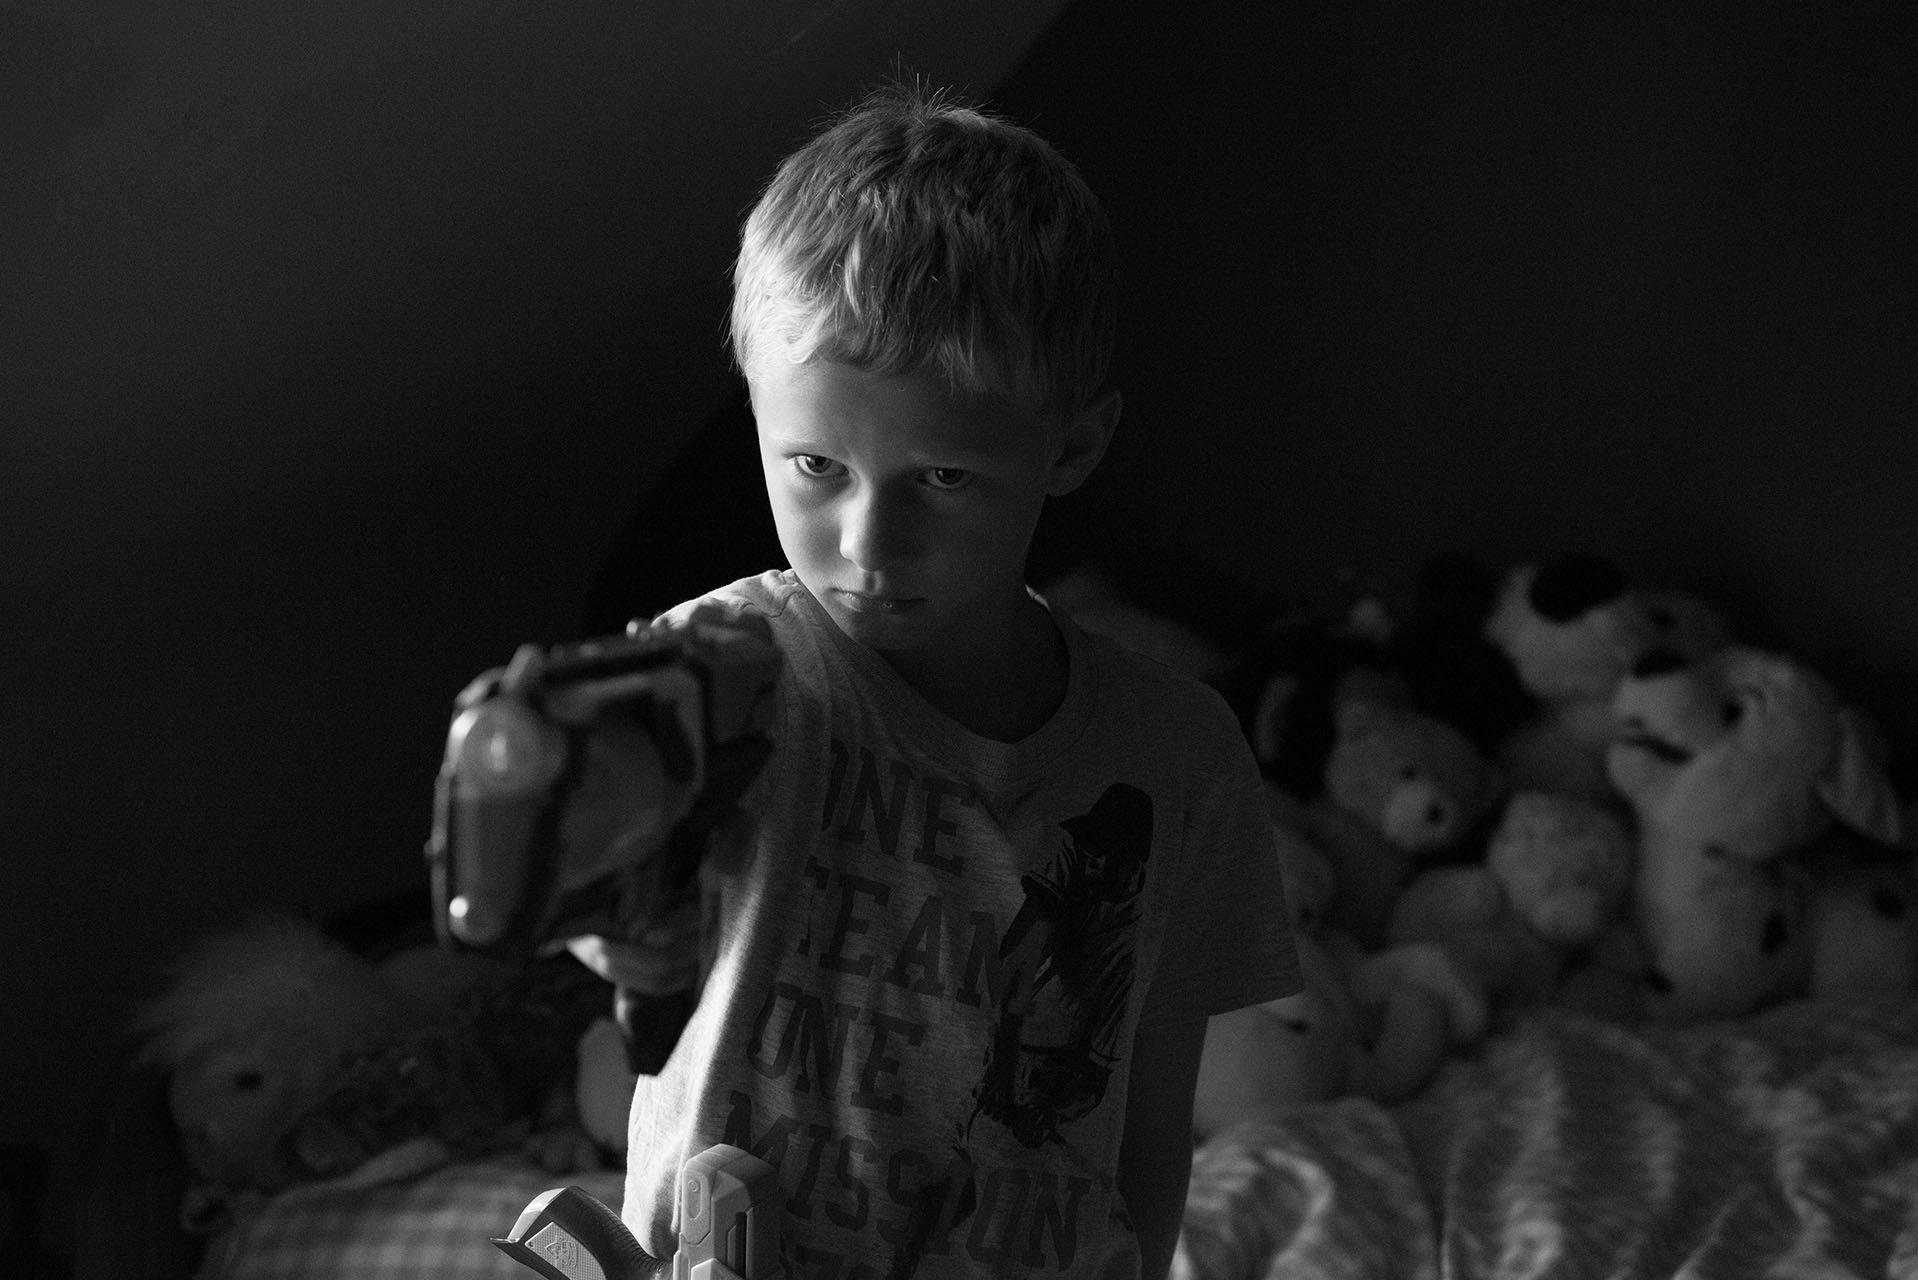 maya-angelsen-photographe-portraits-famille-ile-de-france-val-de-marne